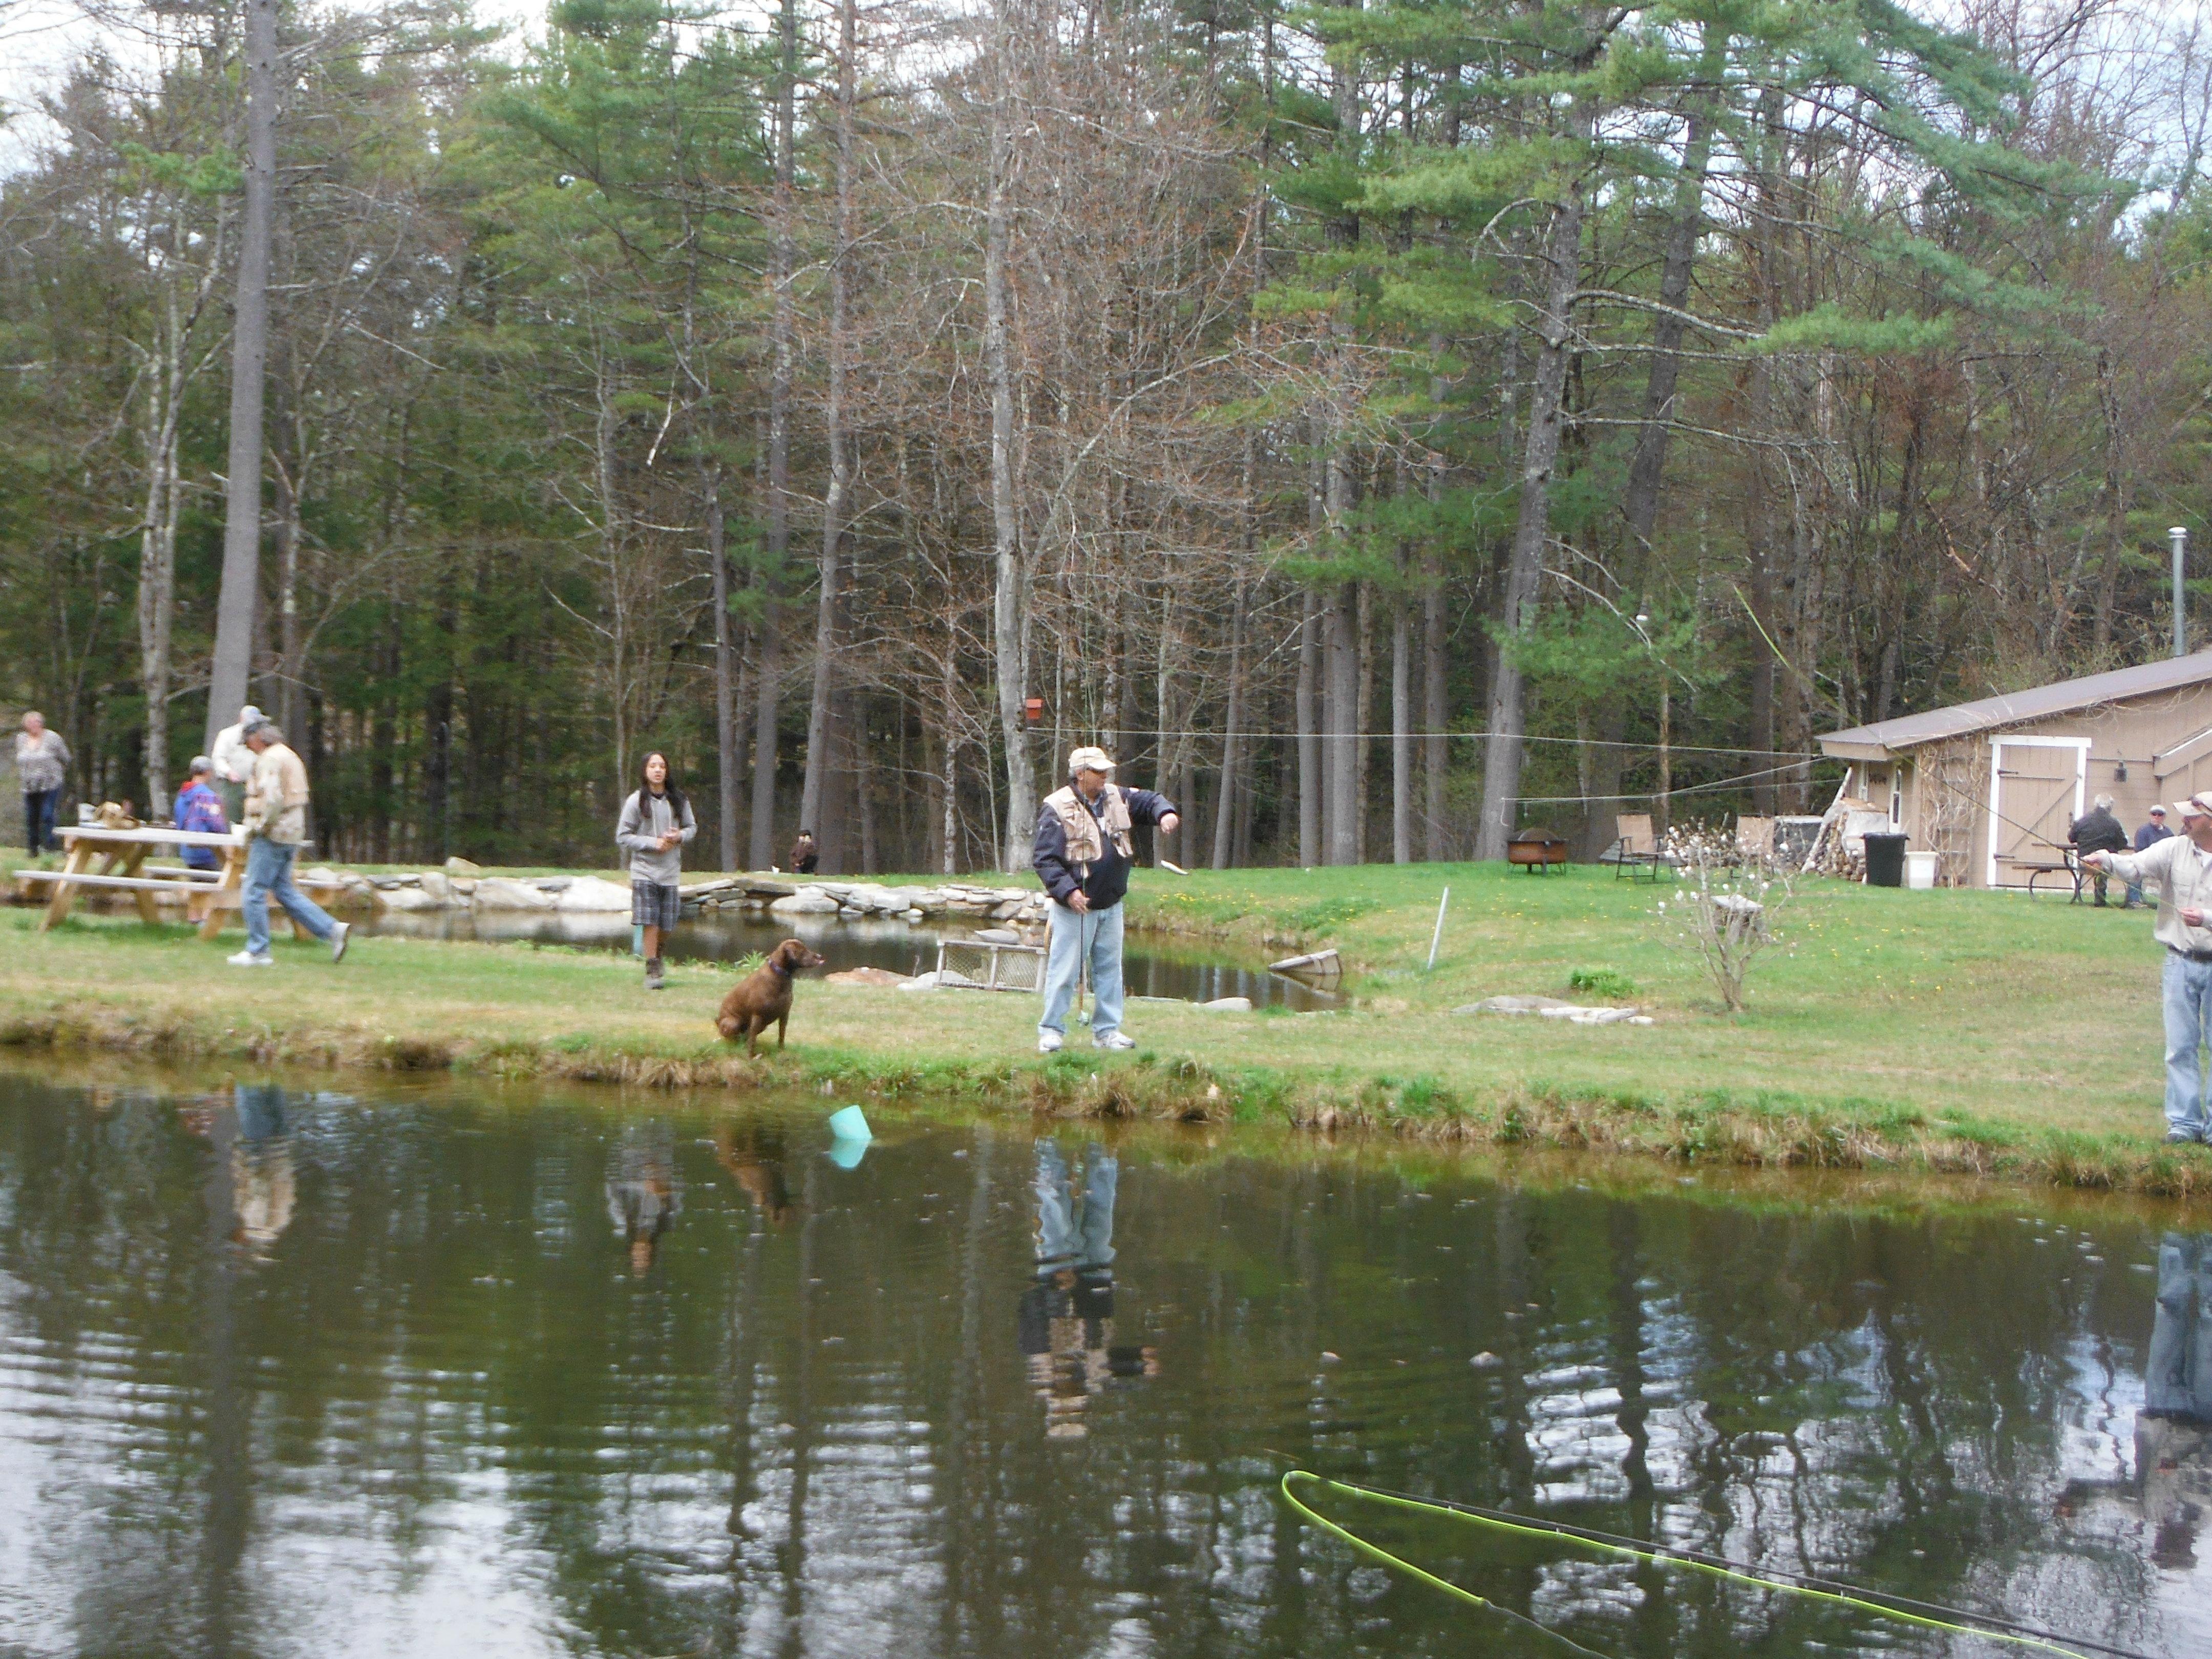 mrfa u2013 project healing waters event at stone hill trout farm